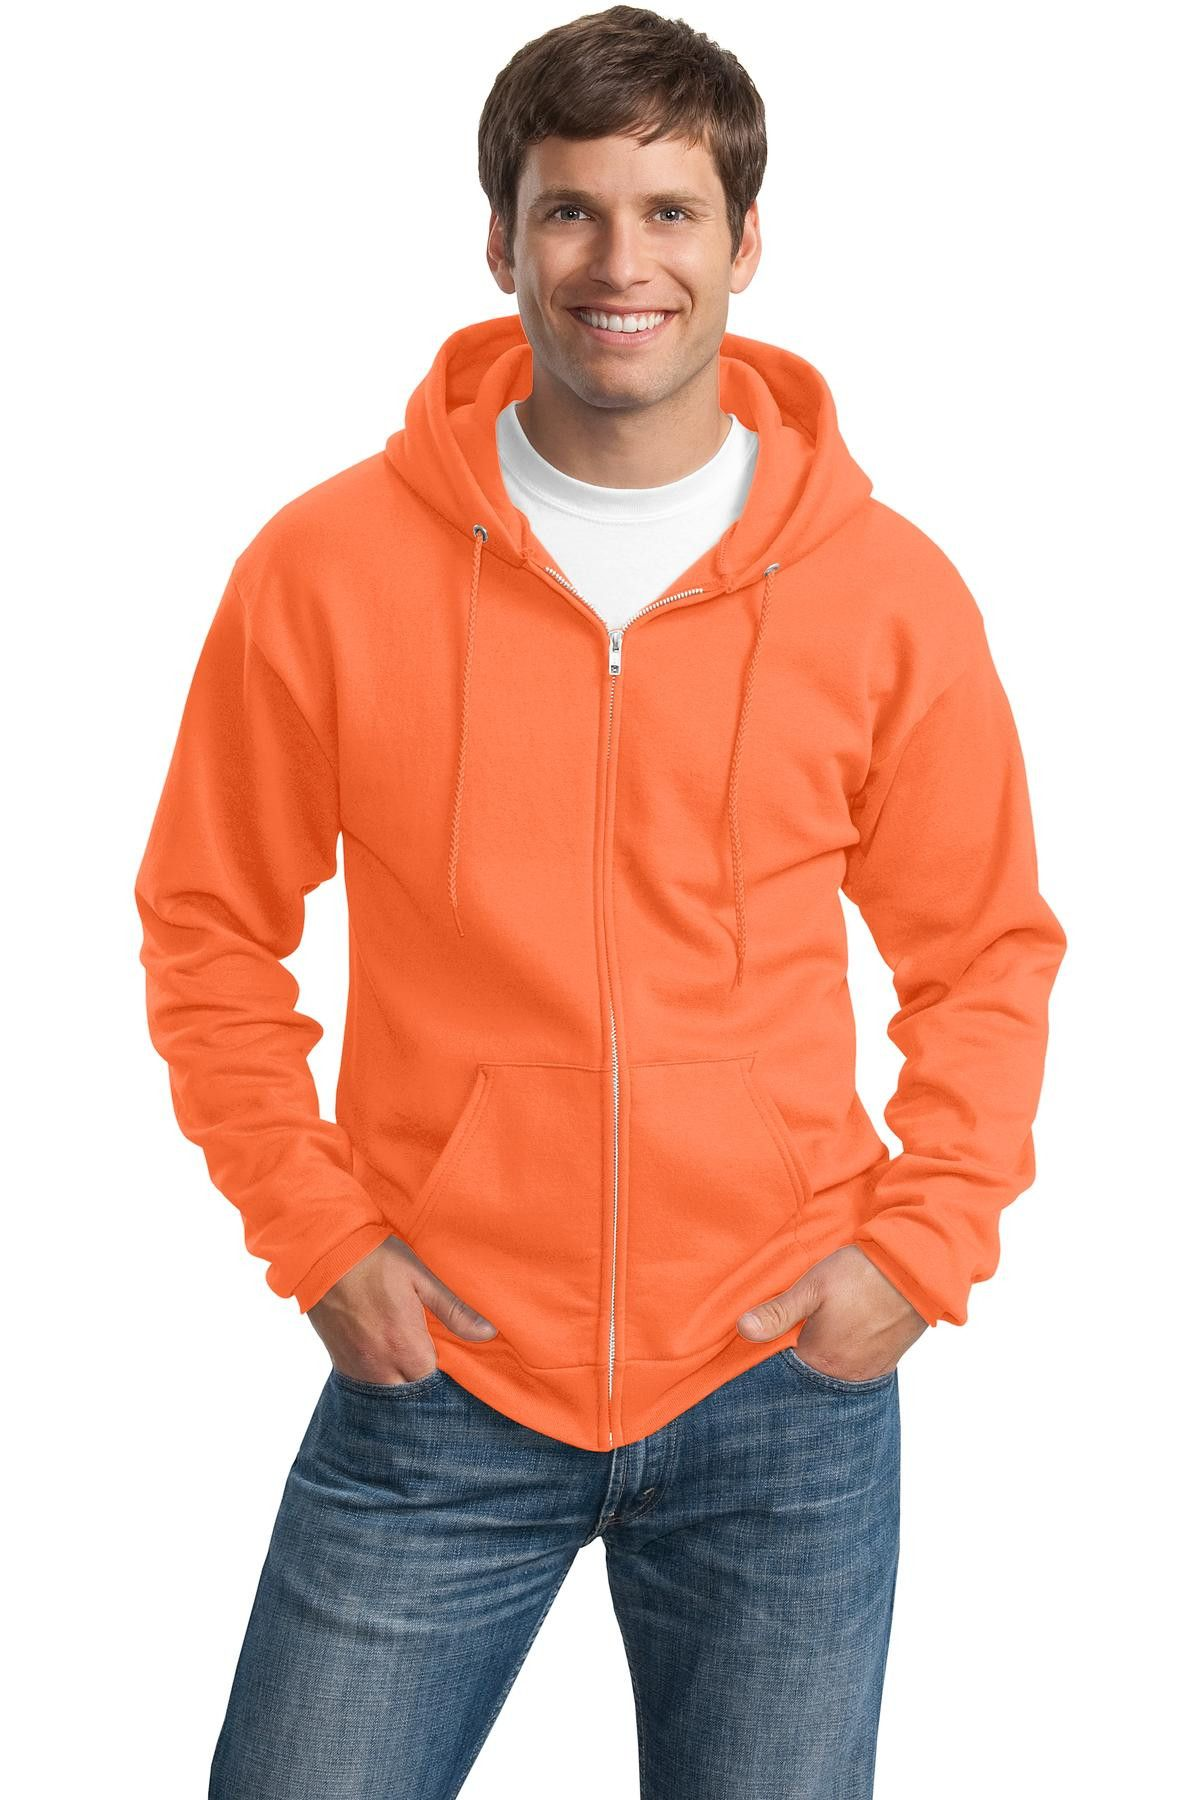 Port & Company - Classic Full-Zip Hooded Sweatshirt PC78ZH Neon Orange